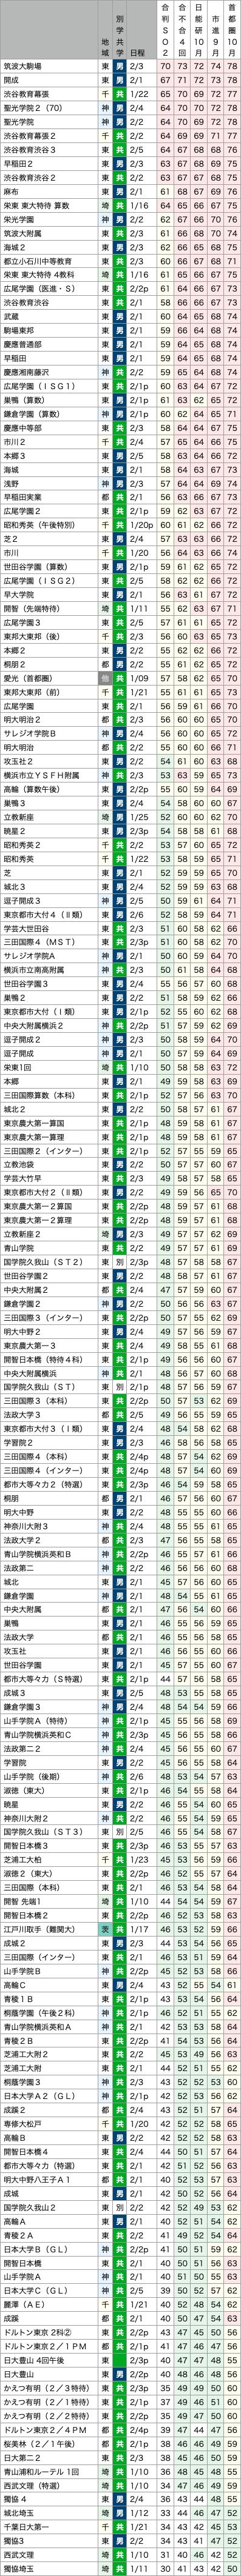 https://e-tutor.tokyo/data/20201104/ss1.png